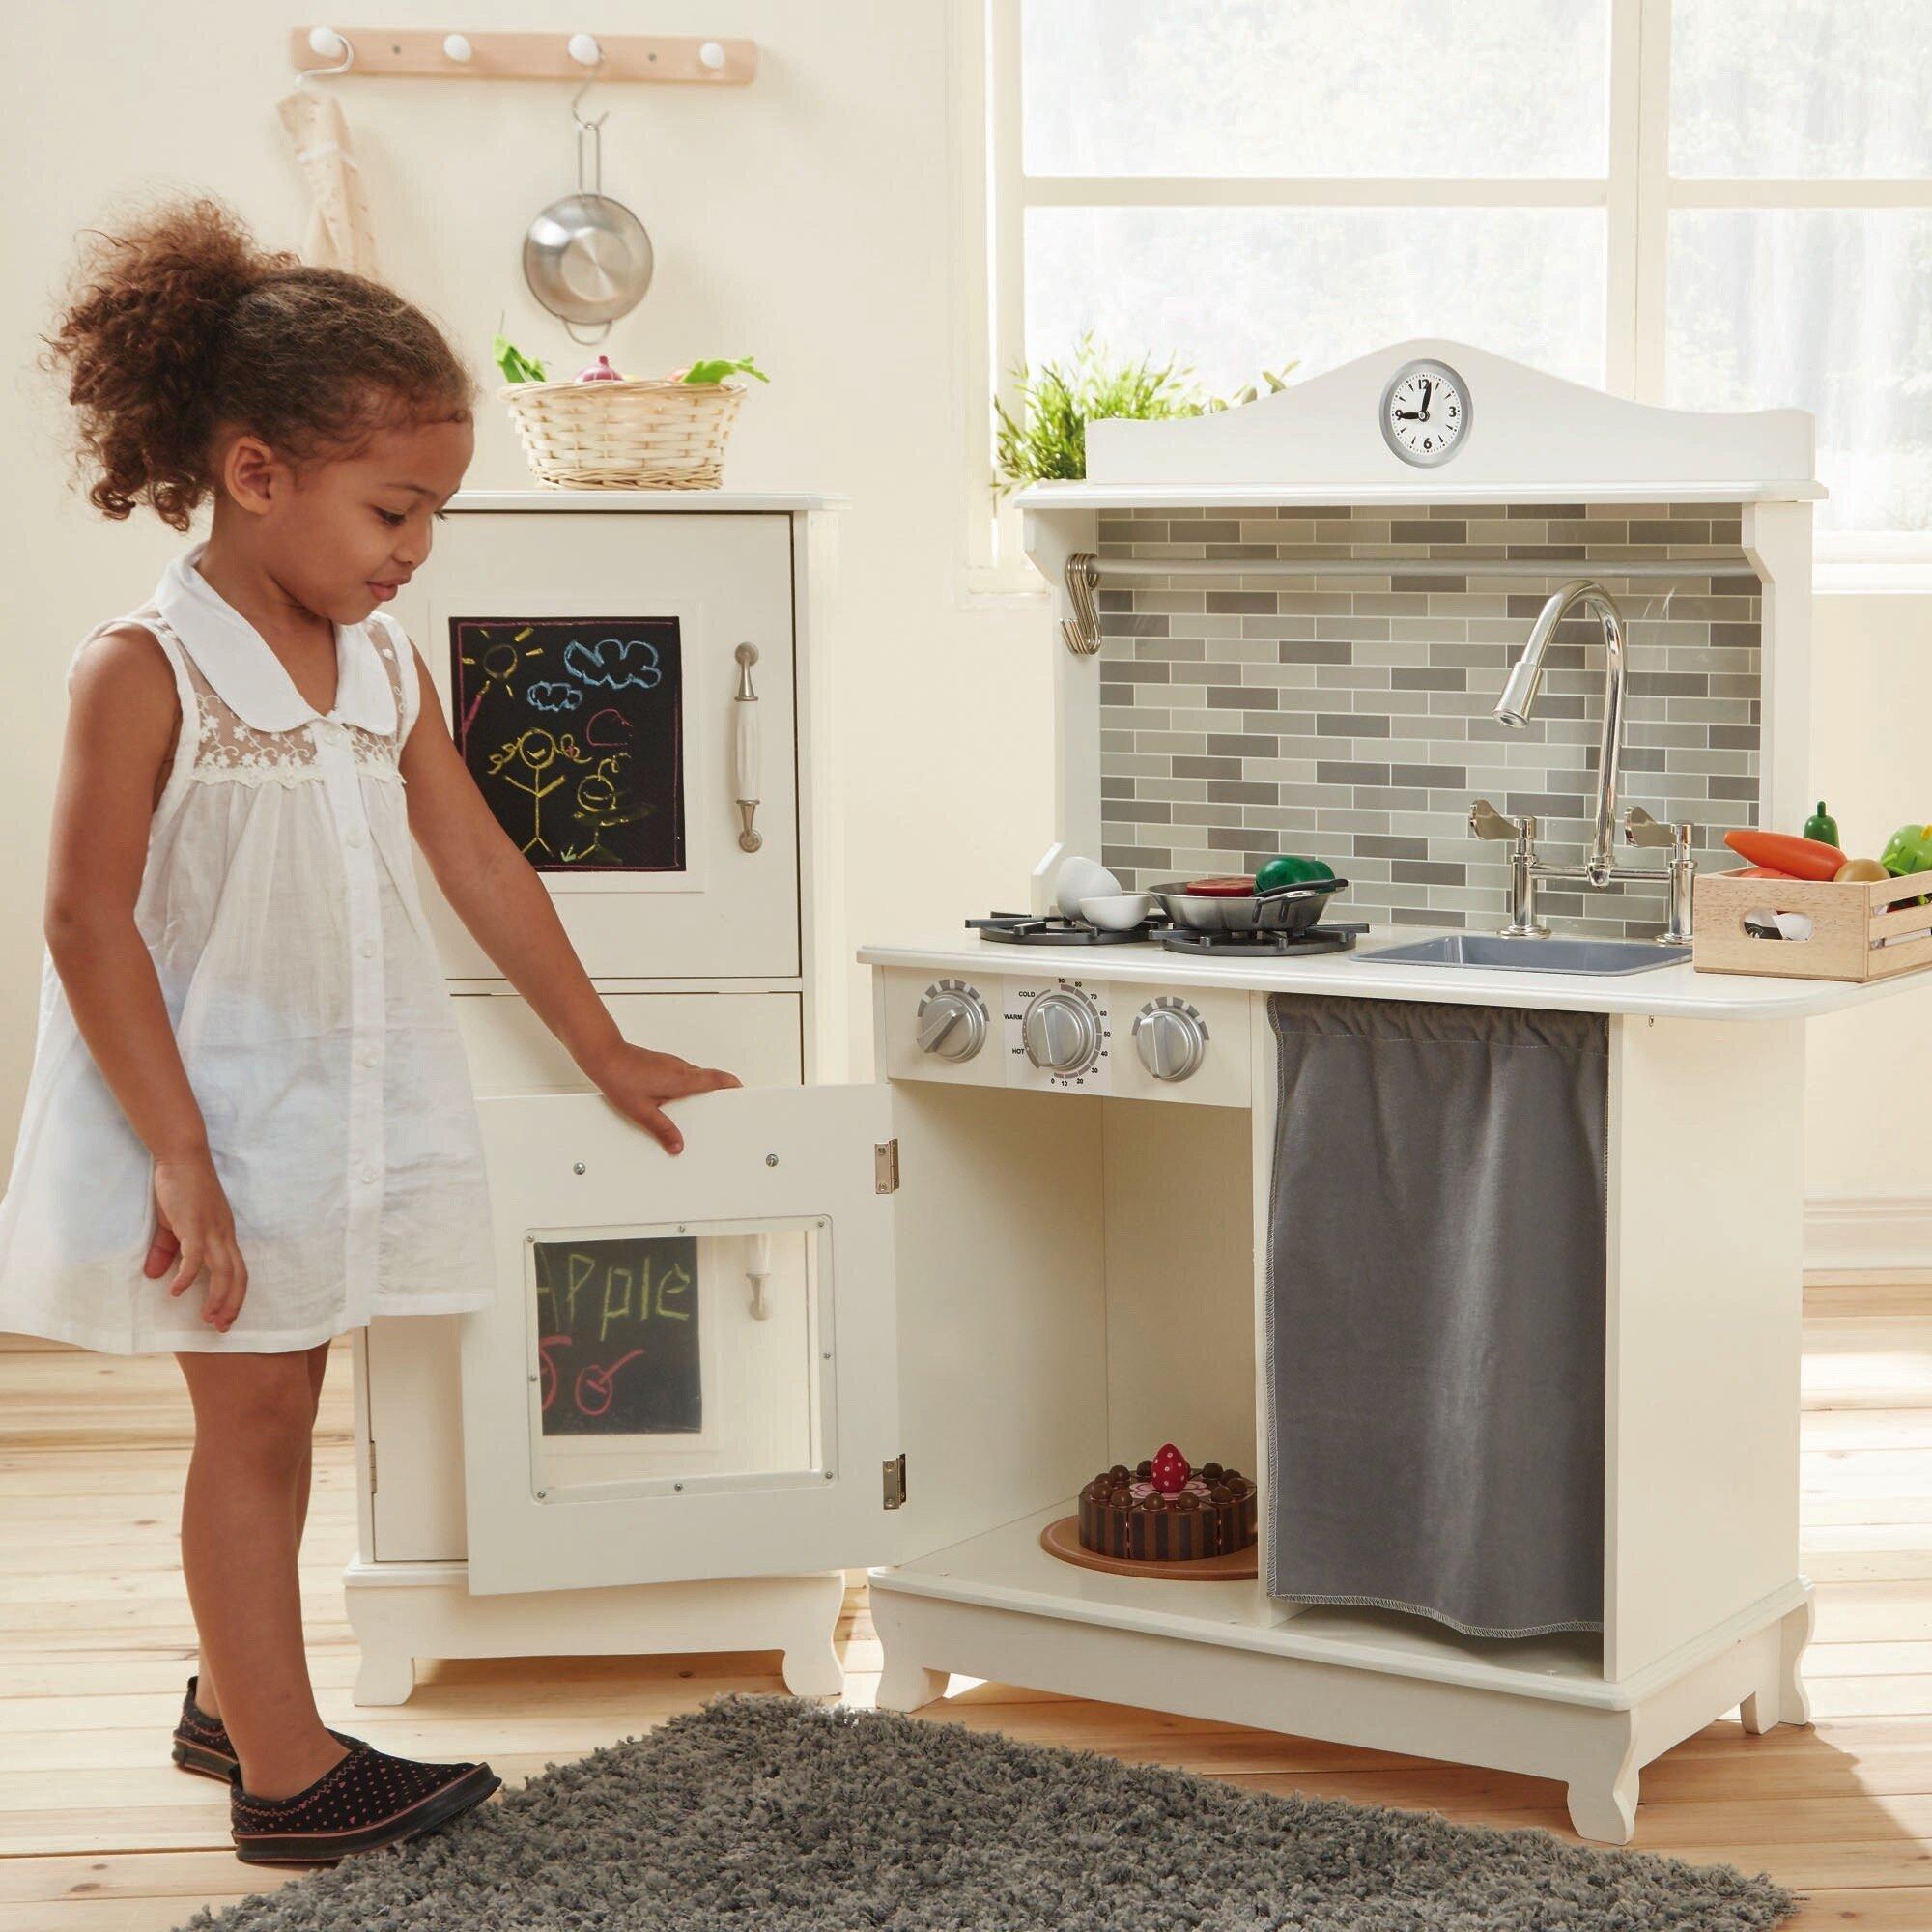 Teamson Kids 3 Piece Sunday Brunch Wooden Play Kitchen Set Reviews Wayfair